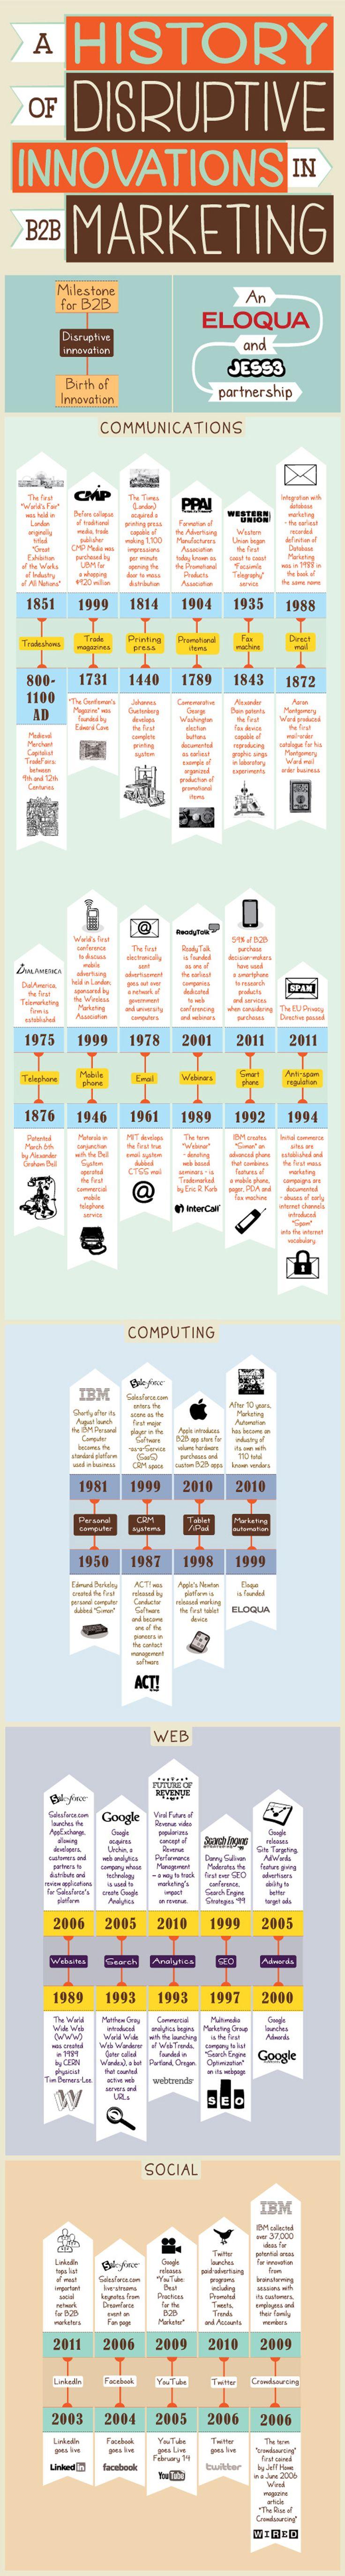 https://thoughtleadershipzen.blogspot.com/ #ThoughtLeadership Eloqua x JESS3: Disruptive Innovations Infographic